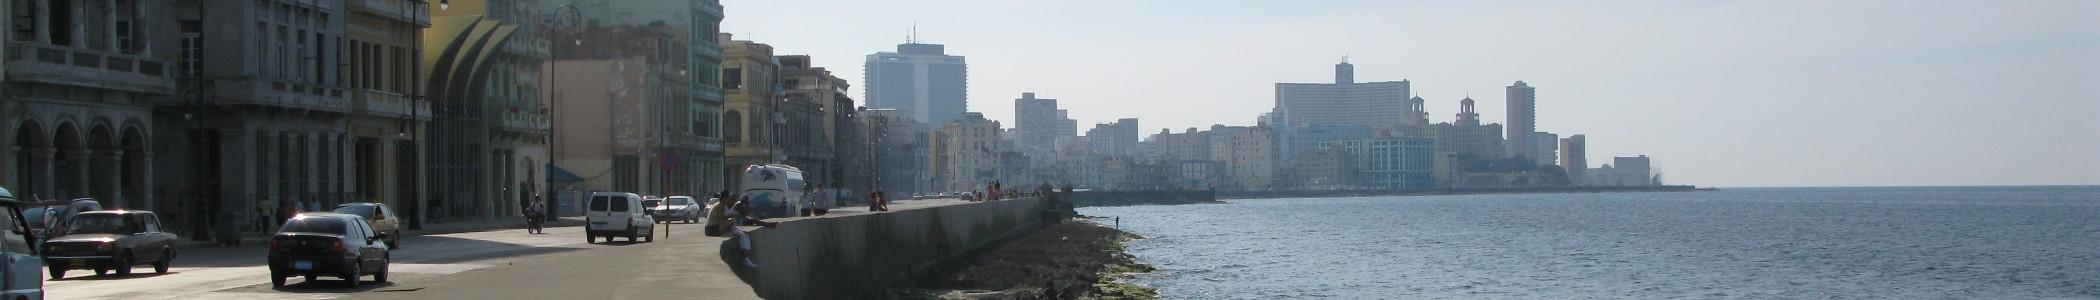 Havana travel guide at wikivoyage havana stopboris Choice Image